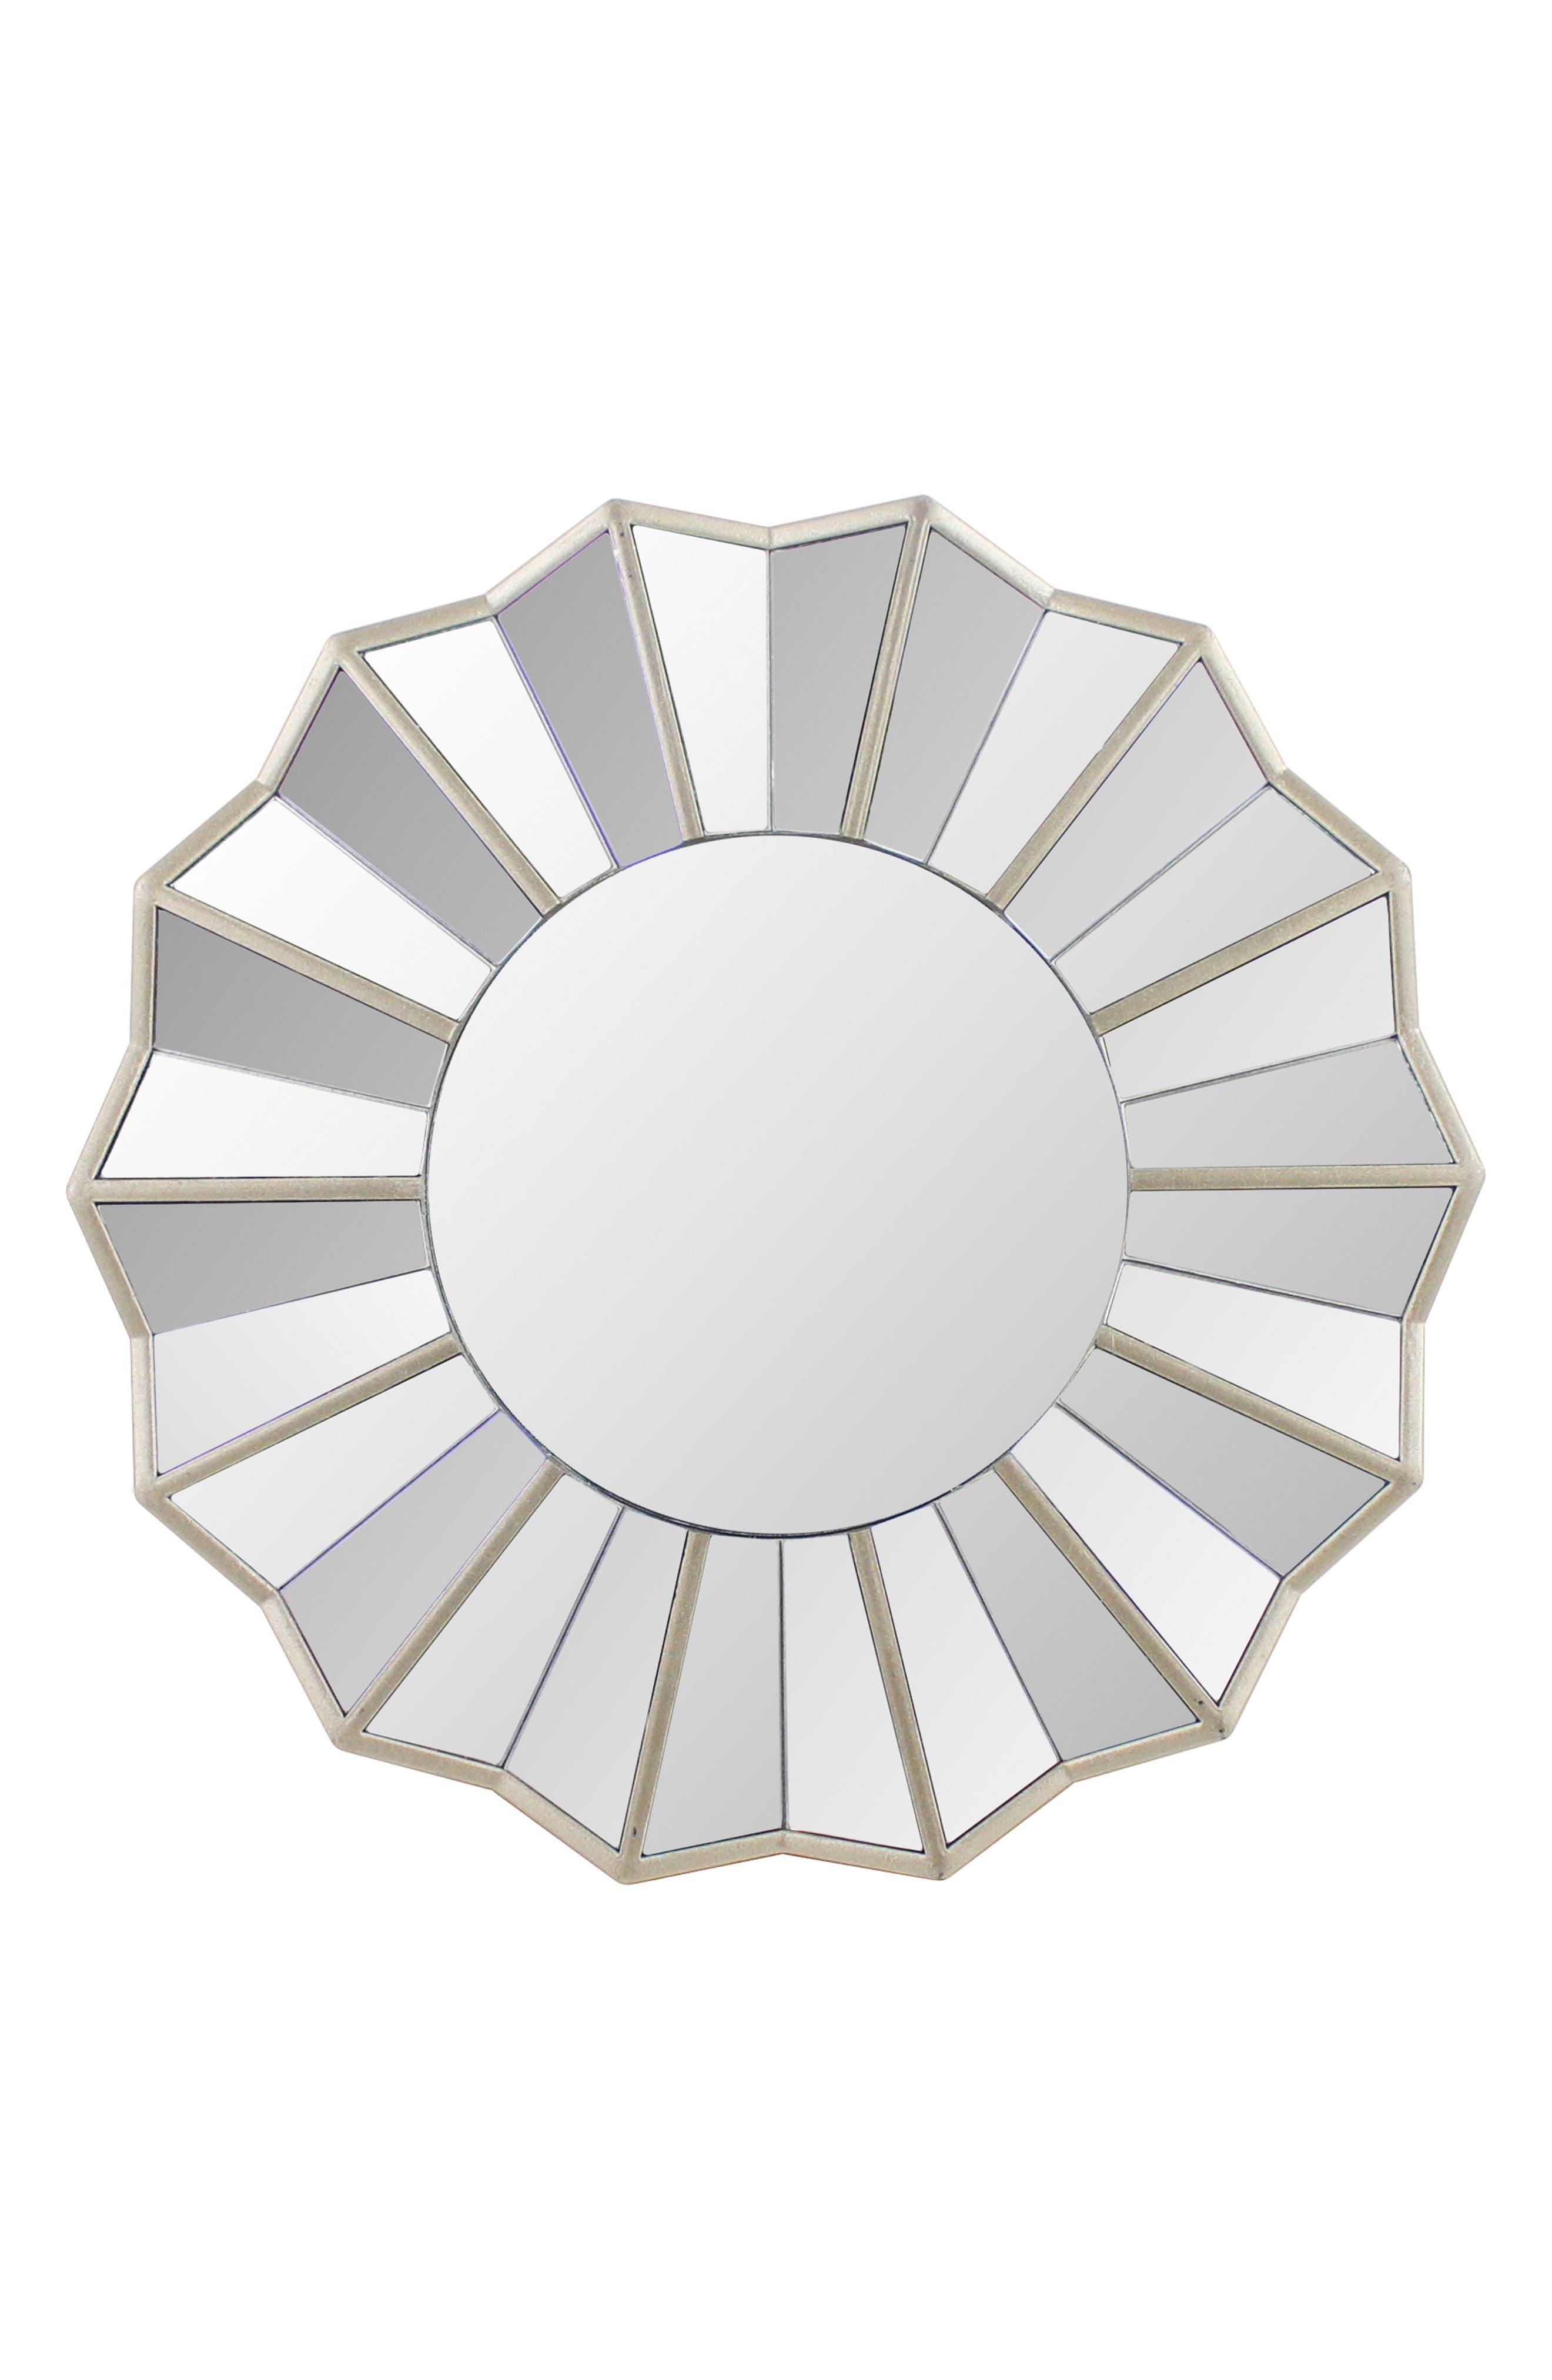 Sunburst Wall Mirror,                             Main thumbnail 1, color,                             040